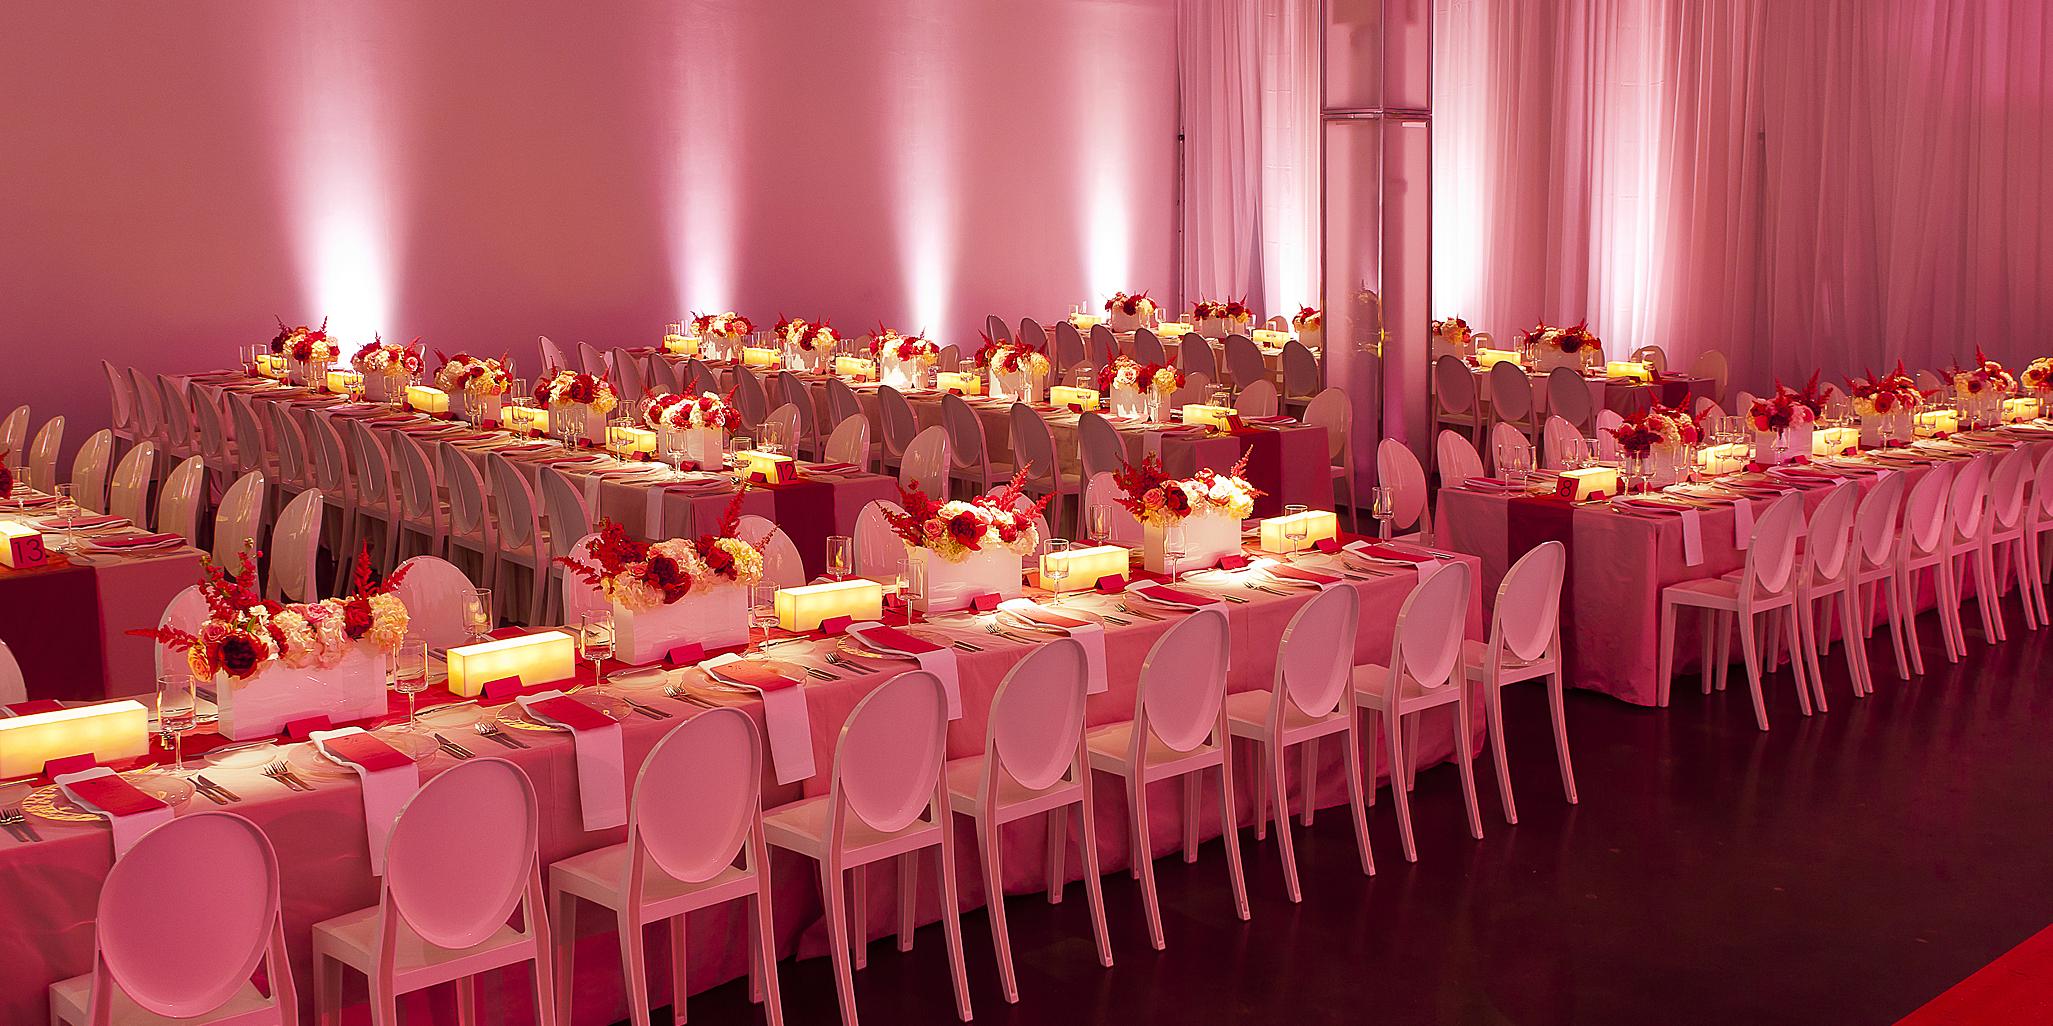 Weddings & Social Affairs